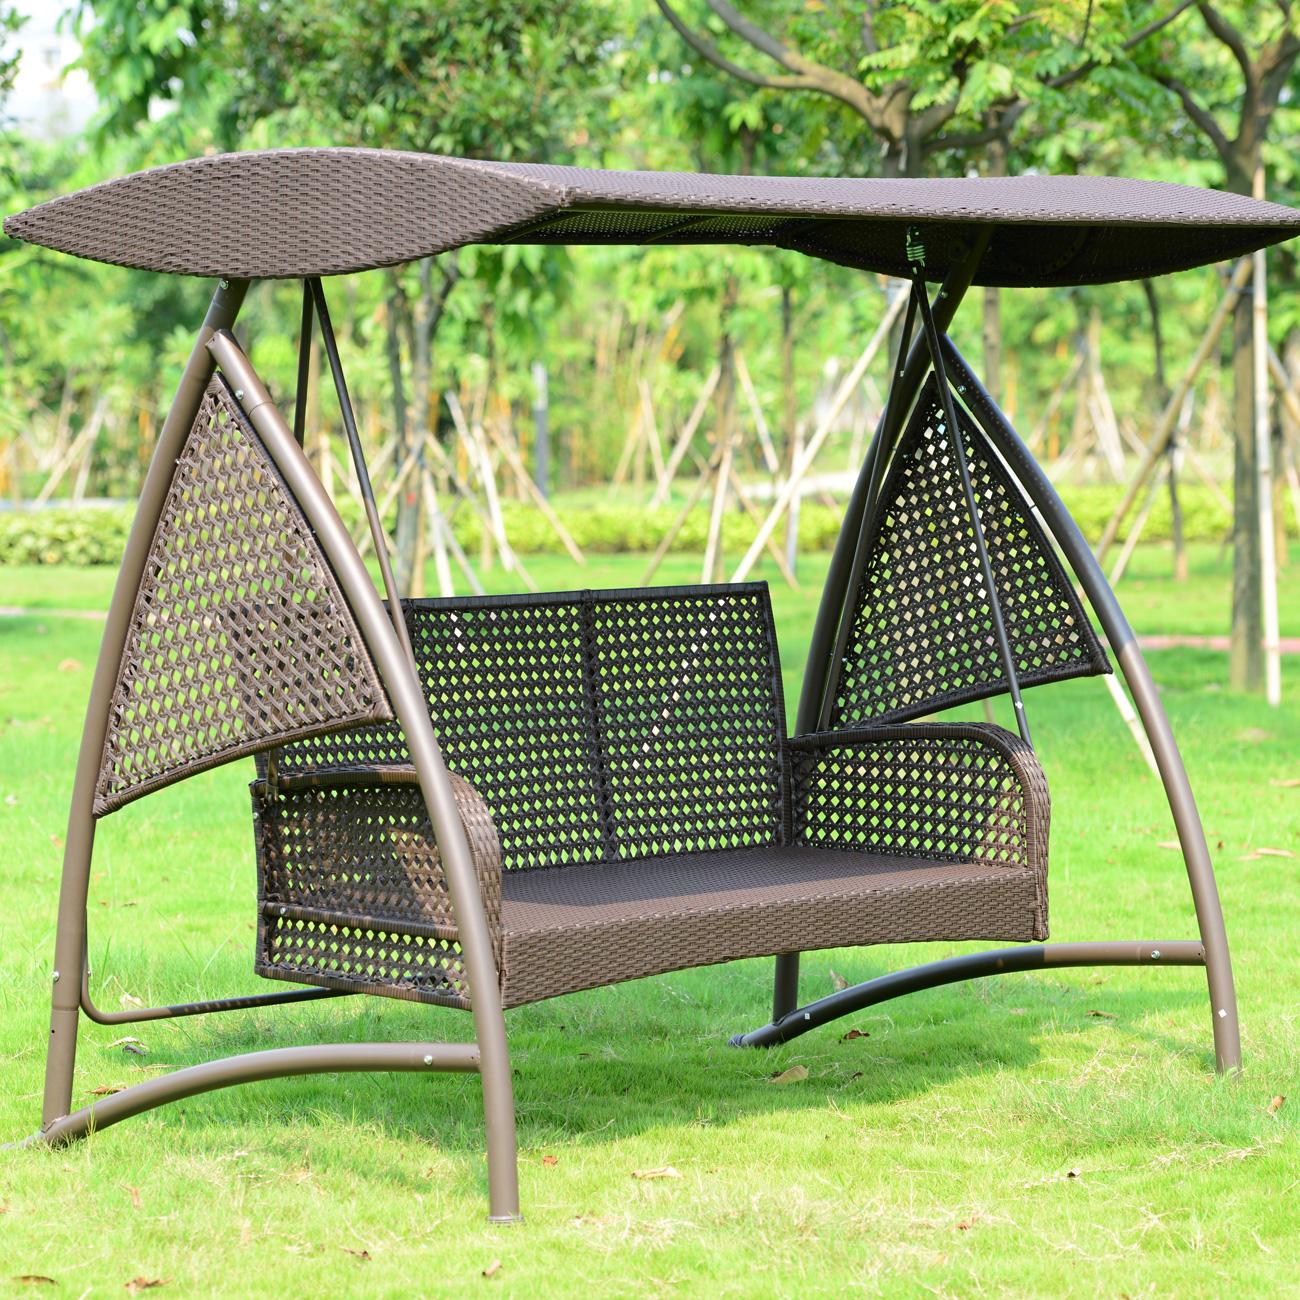 achetez en gros forg swing de fer chaise en ligne des grossistes forg swing de fer chaise. Black Bedroom Furniture Sets. Home Design Ideas